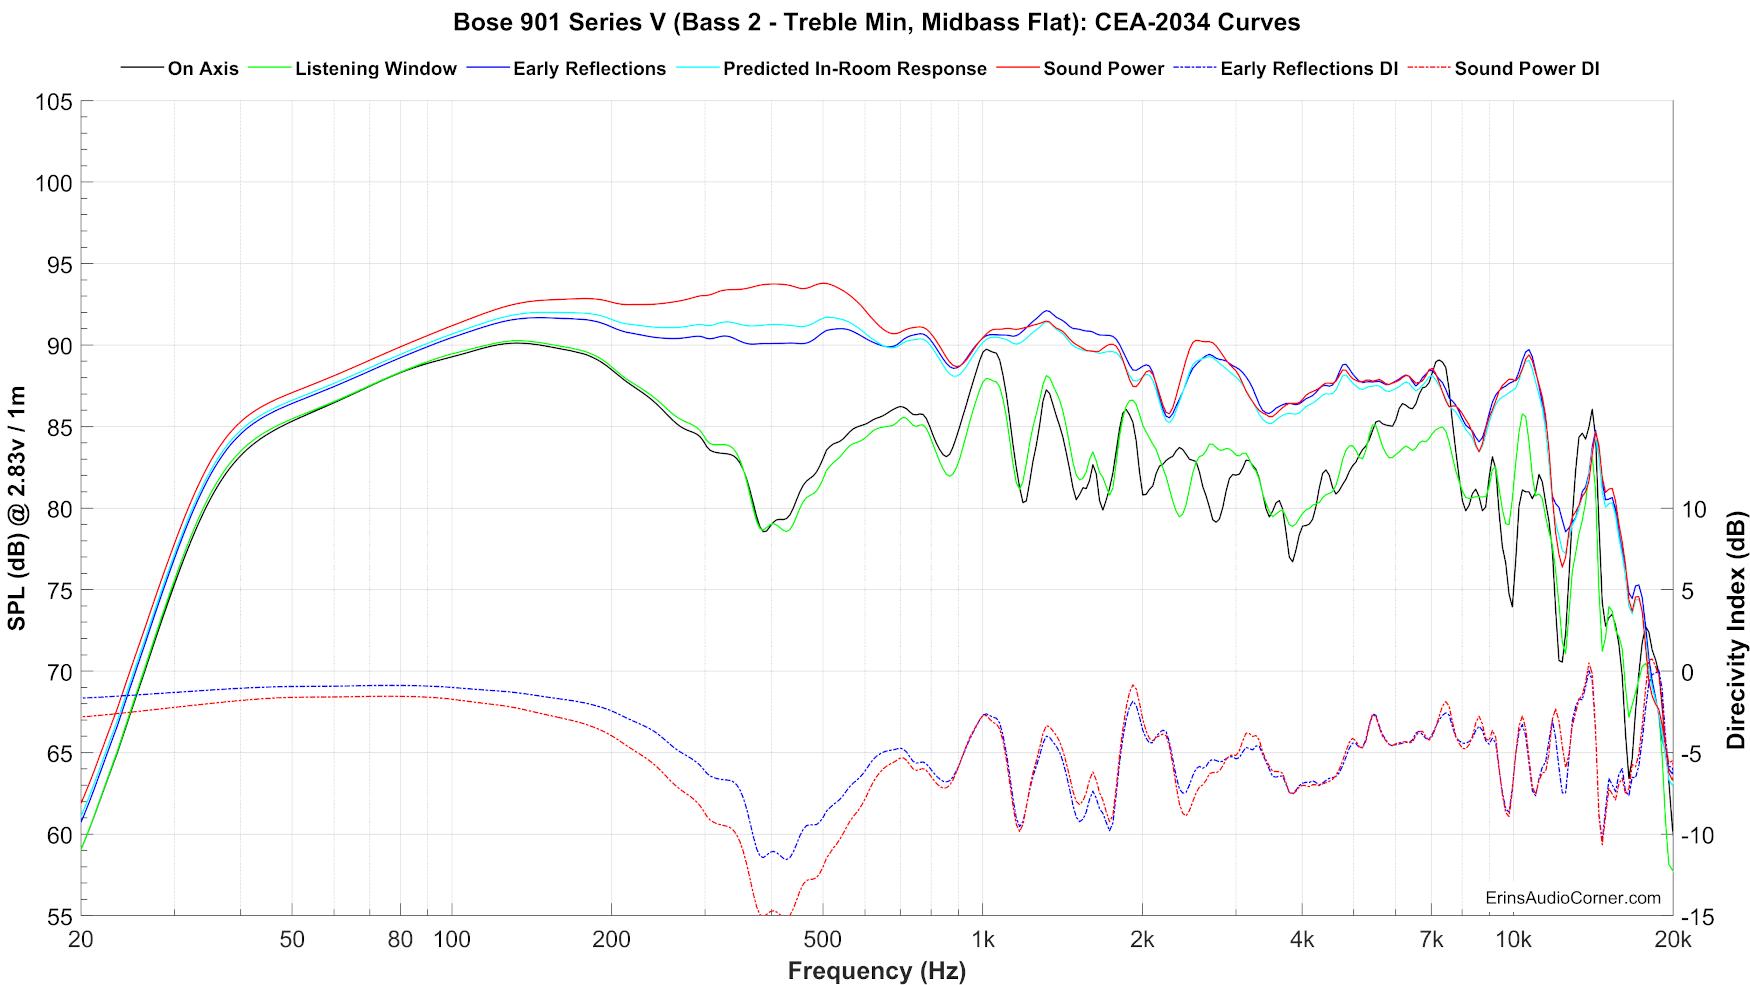 Bose%20901%20Series%20V%20(Bass%202%20-%20Treble%20Min,%20Midbass%20Flat)_SPIN.png